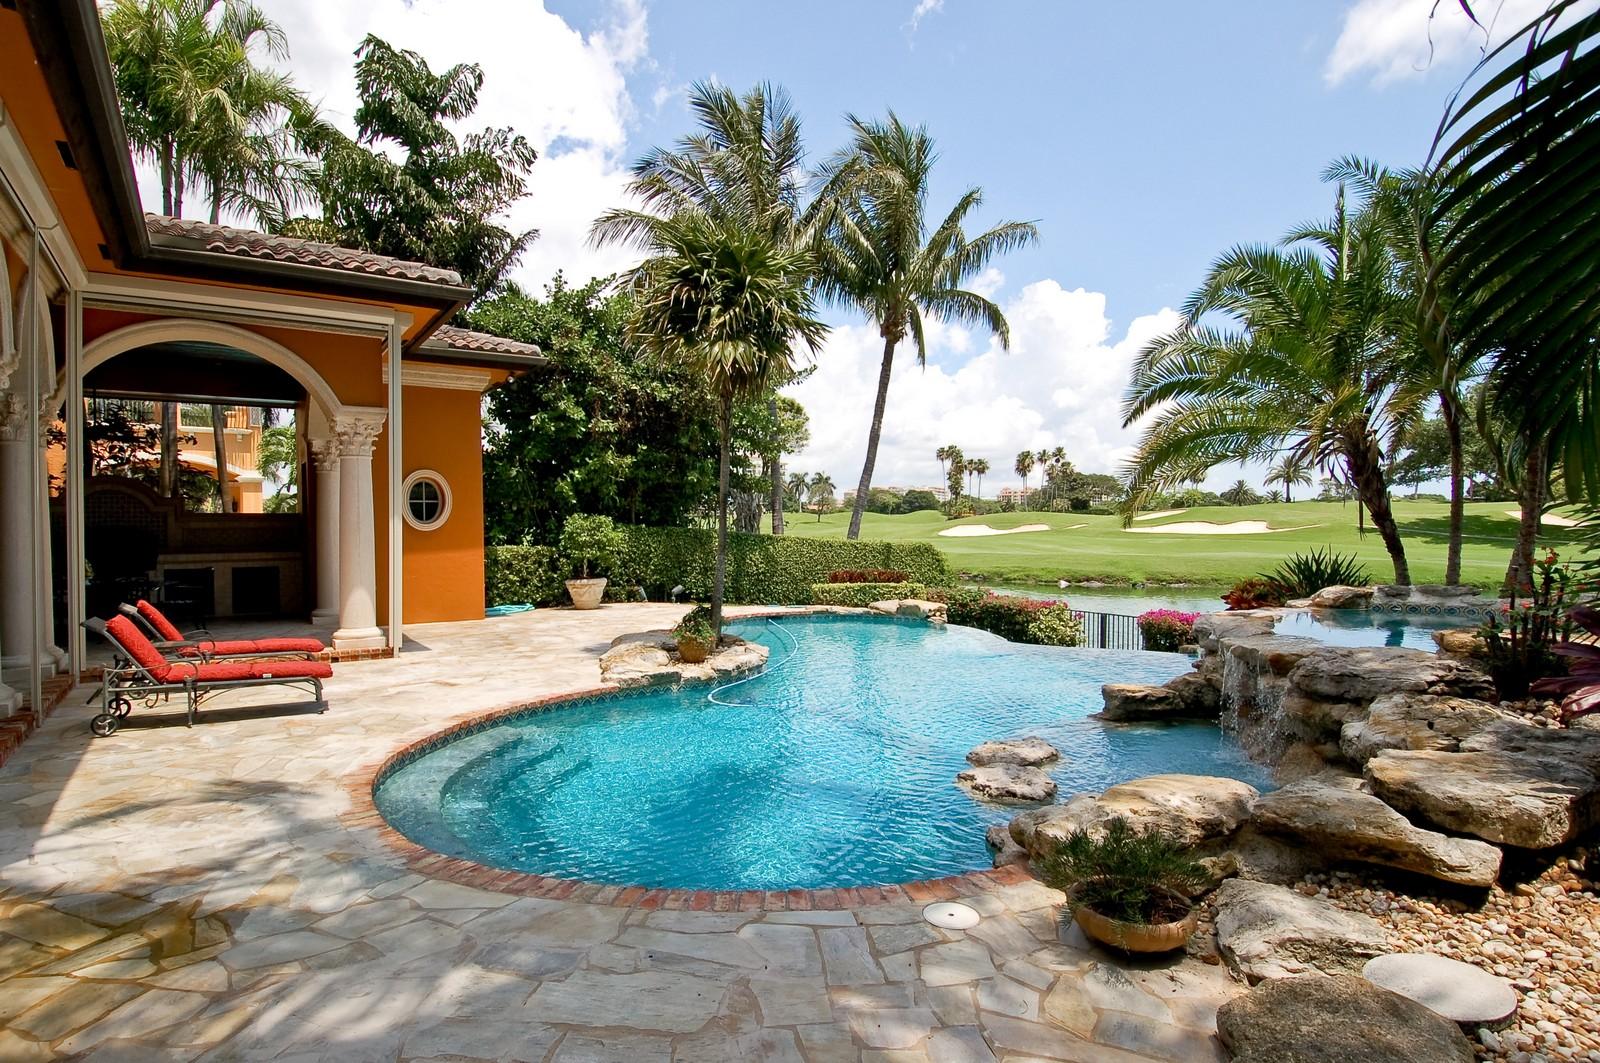 Real Estate Photography - 355 Mizner Lake Dr, Boca Raton, FL, 33432 - Pool